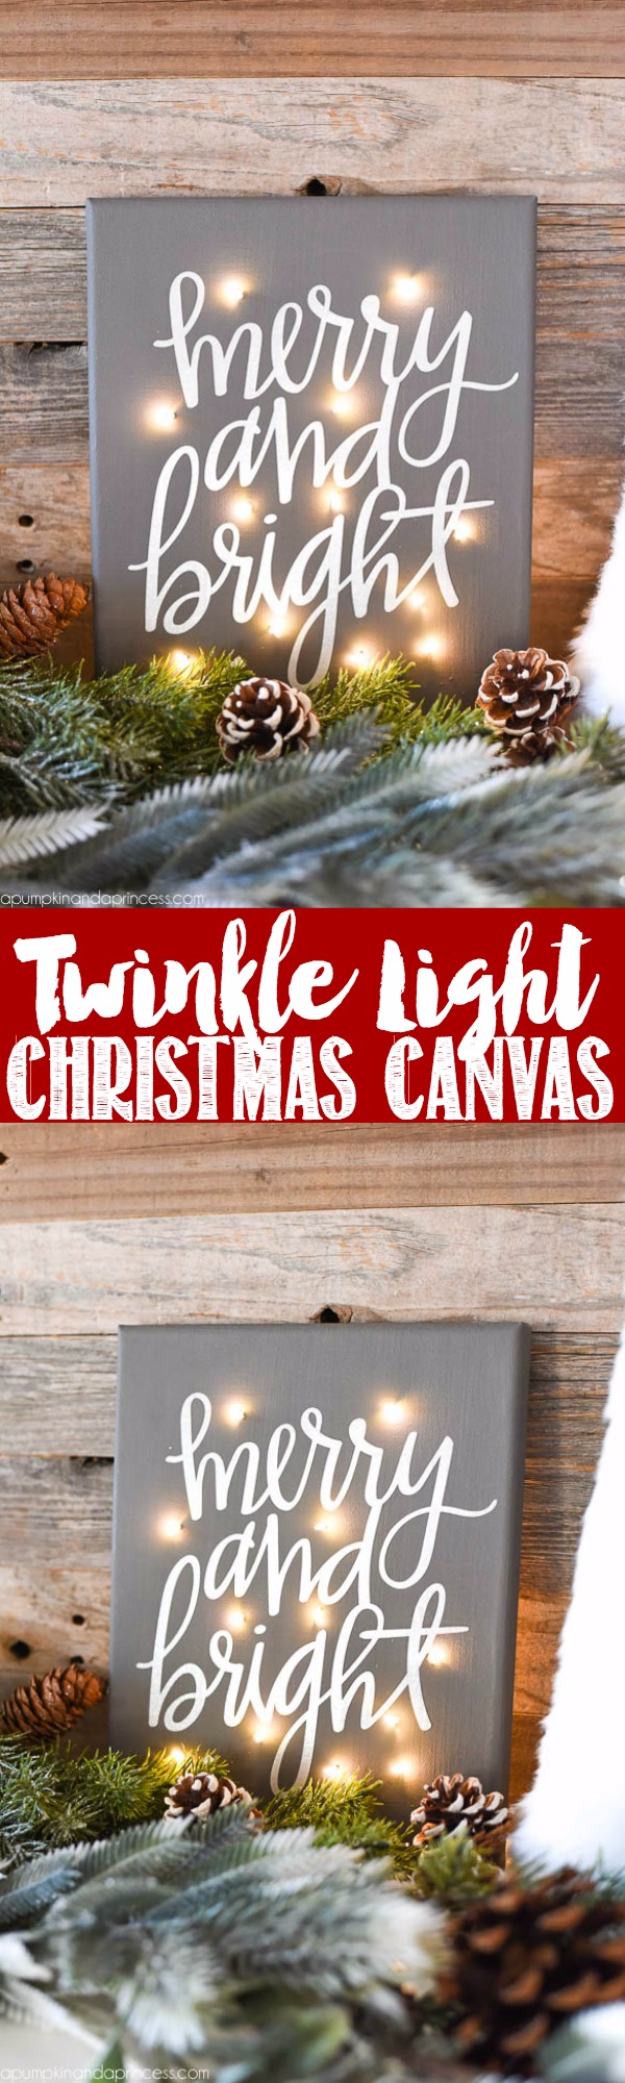 Fun Ways To Use Christmas Lights - DIY Twinkle Light Christmas Canvas - Best Easy DIY Ideas for String Lights for Room Decoration, Home Decor and Creative DIY Bedroom Lighting #diy #christmas #homedecor